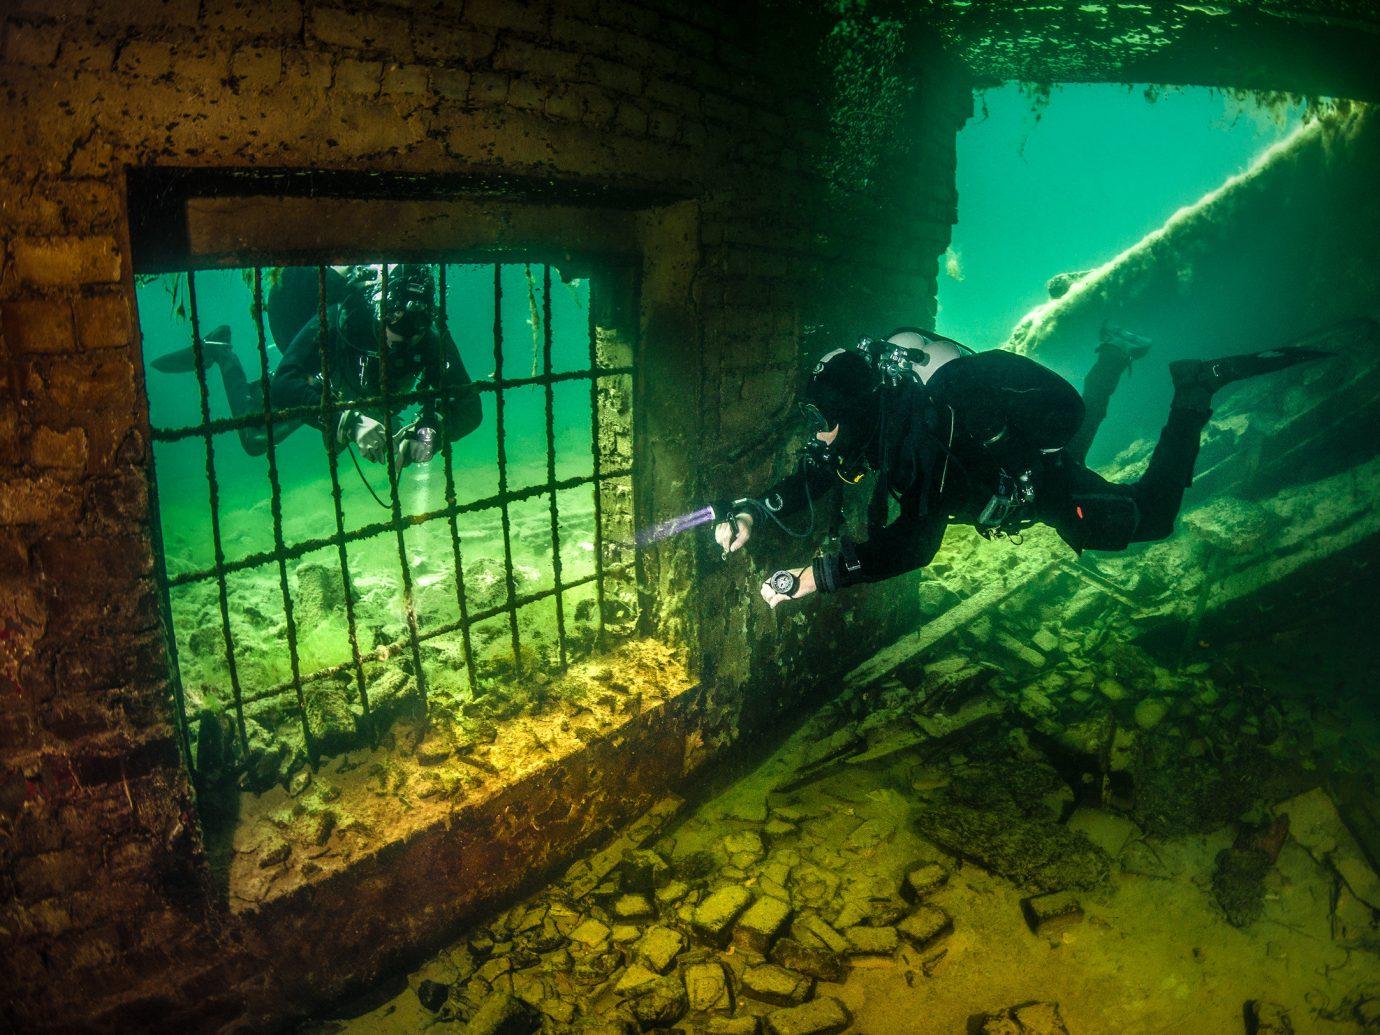 Offbeat green marine biology underwater biology swimming screenshot aquarium